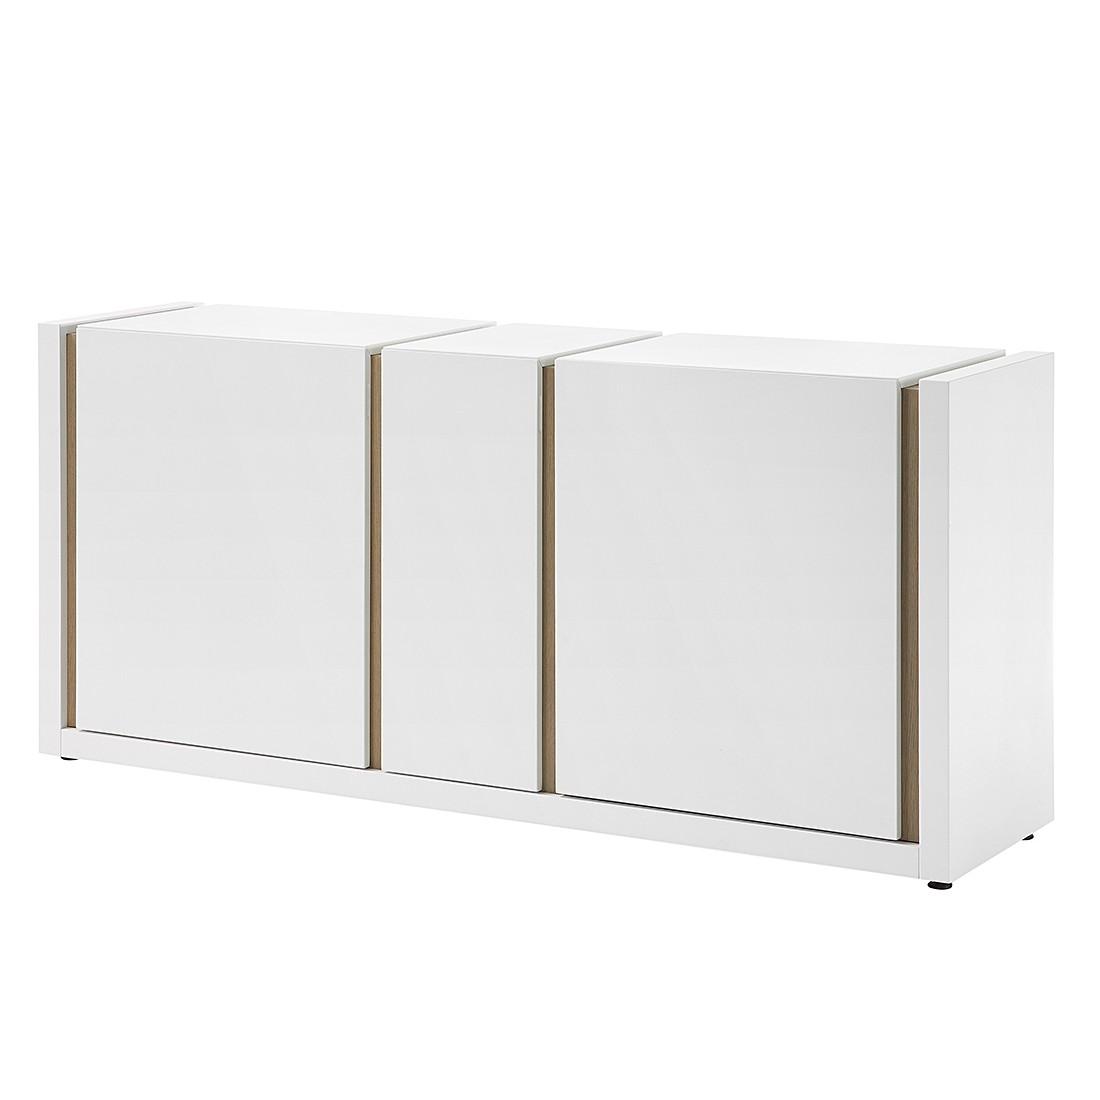 Sideboard Thule I - Matt Weiß, loftscape